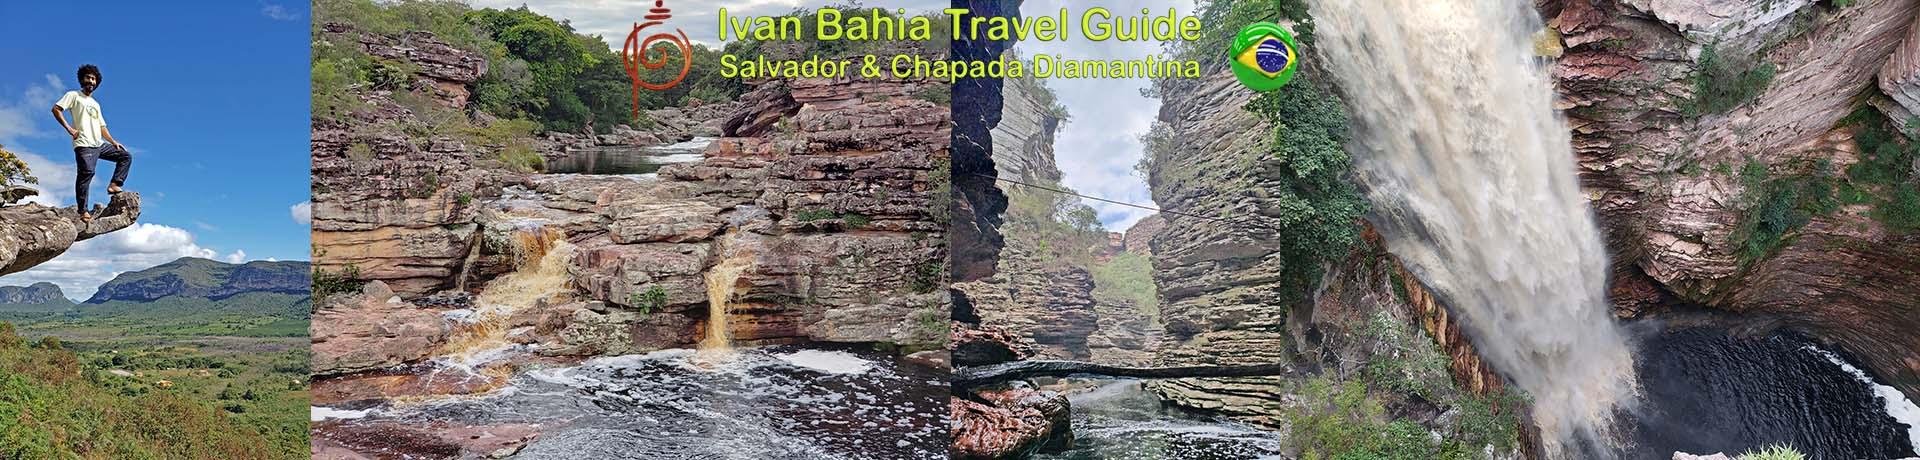 Ivan Bahia tour-guide /  les meilleures ballades en  Chapada Diamantina Parc National (connu comme le 'Grand Canyon Brésilien') guide francophone / #ibtg #ibg #ivanbahiaguide #ivanbahiatravelguide #zenturturismo #ivanchapadadiamantinaguide #valedopati #patyvalley #pati #viapati #valecapao #ivanchapadaguide #chapadadiamantinatransfer #chapadatrekking #chapadaroots #chapadasoul #lencoisbahia #chapadadiamantinatrekking #ivanchapadadiamantinaguide  #chapadadiamantinaguide  #guidechapadadiamantina #lencois #lençois #chapadaadventuredaniel #diamondmountains #zentur # #guiachapadadiamantina #chapadaaventure #discoverchapada #chapadadiamond #chapadasoul #diamantinatrip  #tripadvisor #bahiametisse, #fernandobingre, #ivansalvadorbahia #salvadorbahiaTravel #toursbylocals #fotosbahia #bahiafotos #chapadadiamantinanationalpark #yourtoursbrazil #maurotours #bahiatopturismo #bahiapremium #maisbahiaturismo #fernandobingretourguide #cassiturismo